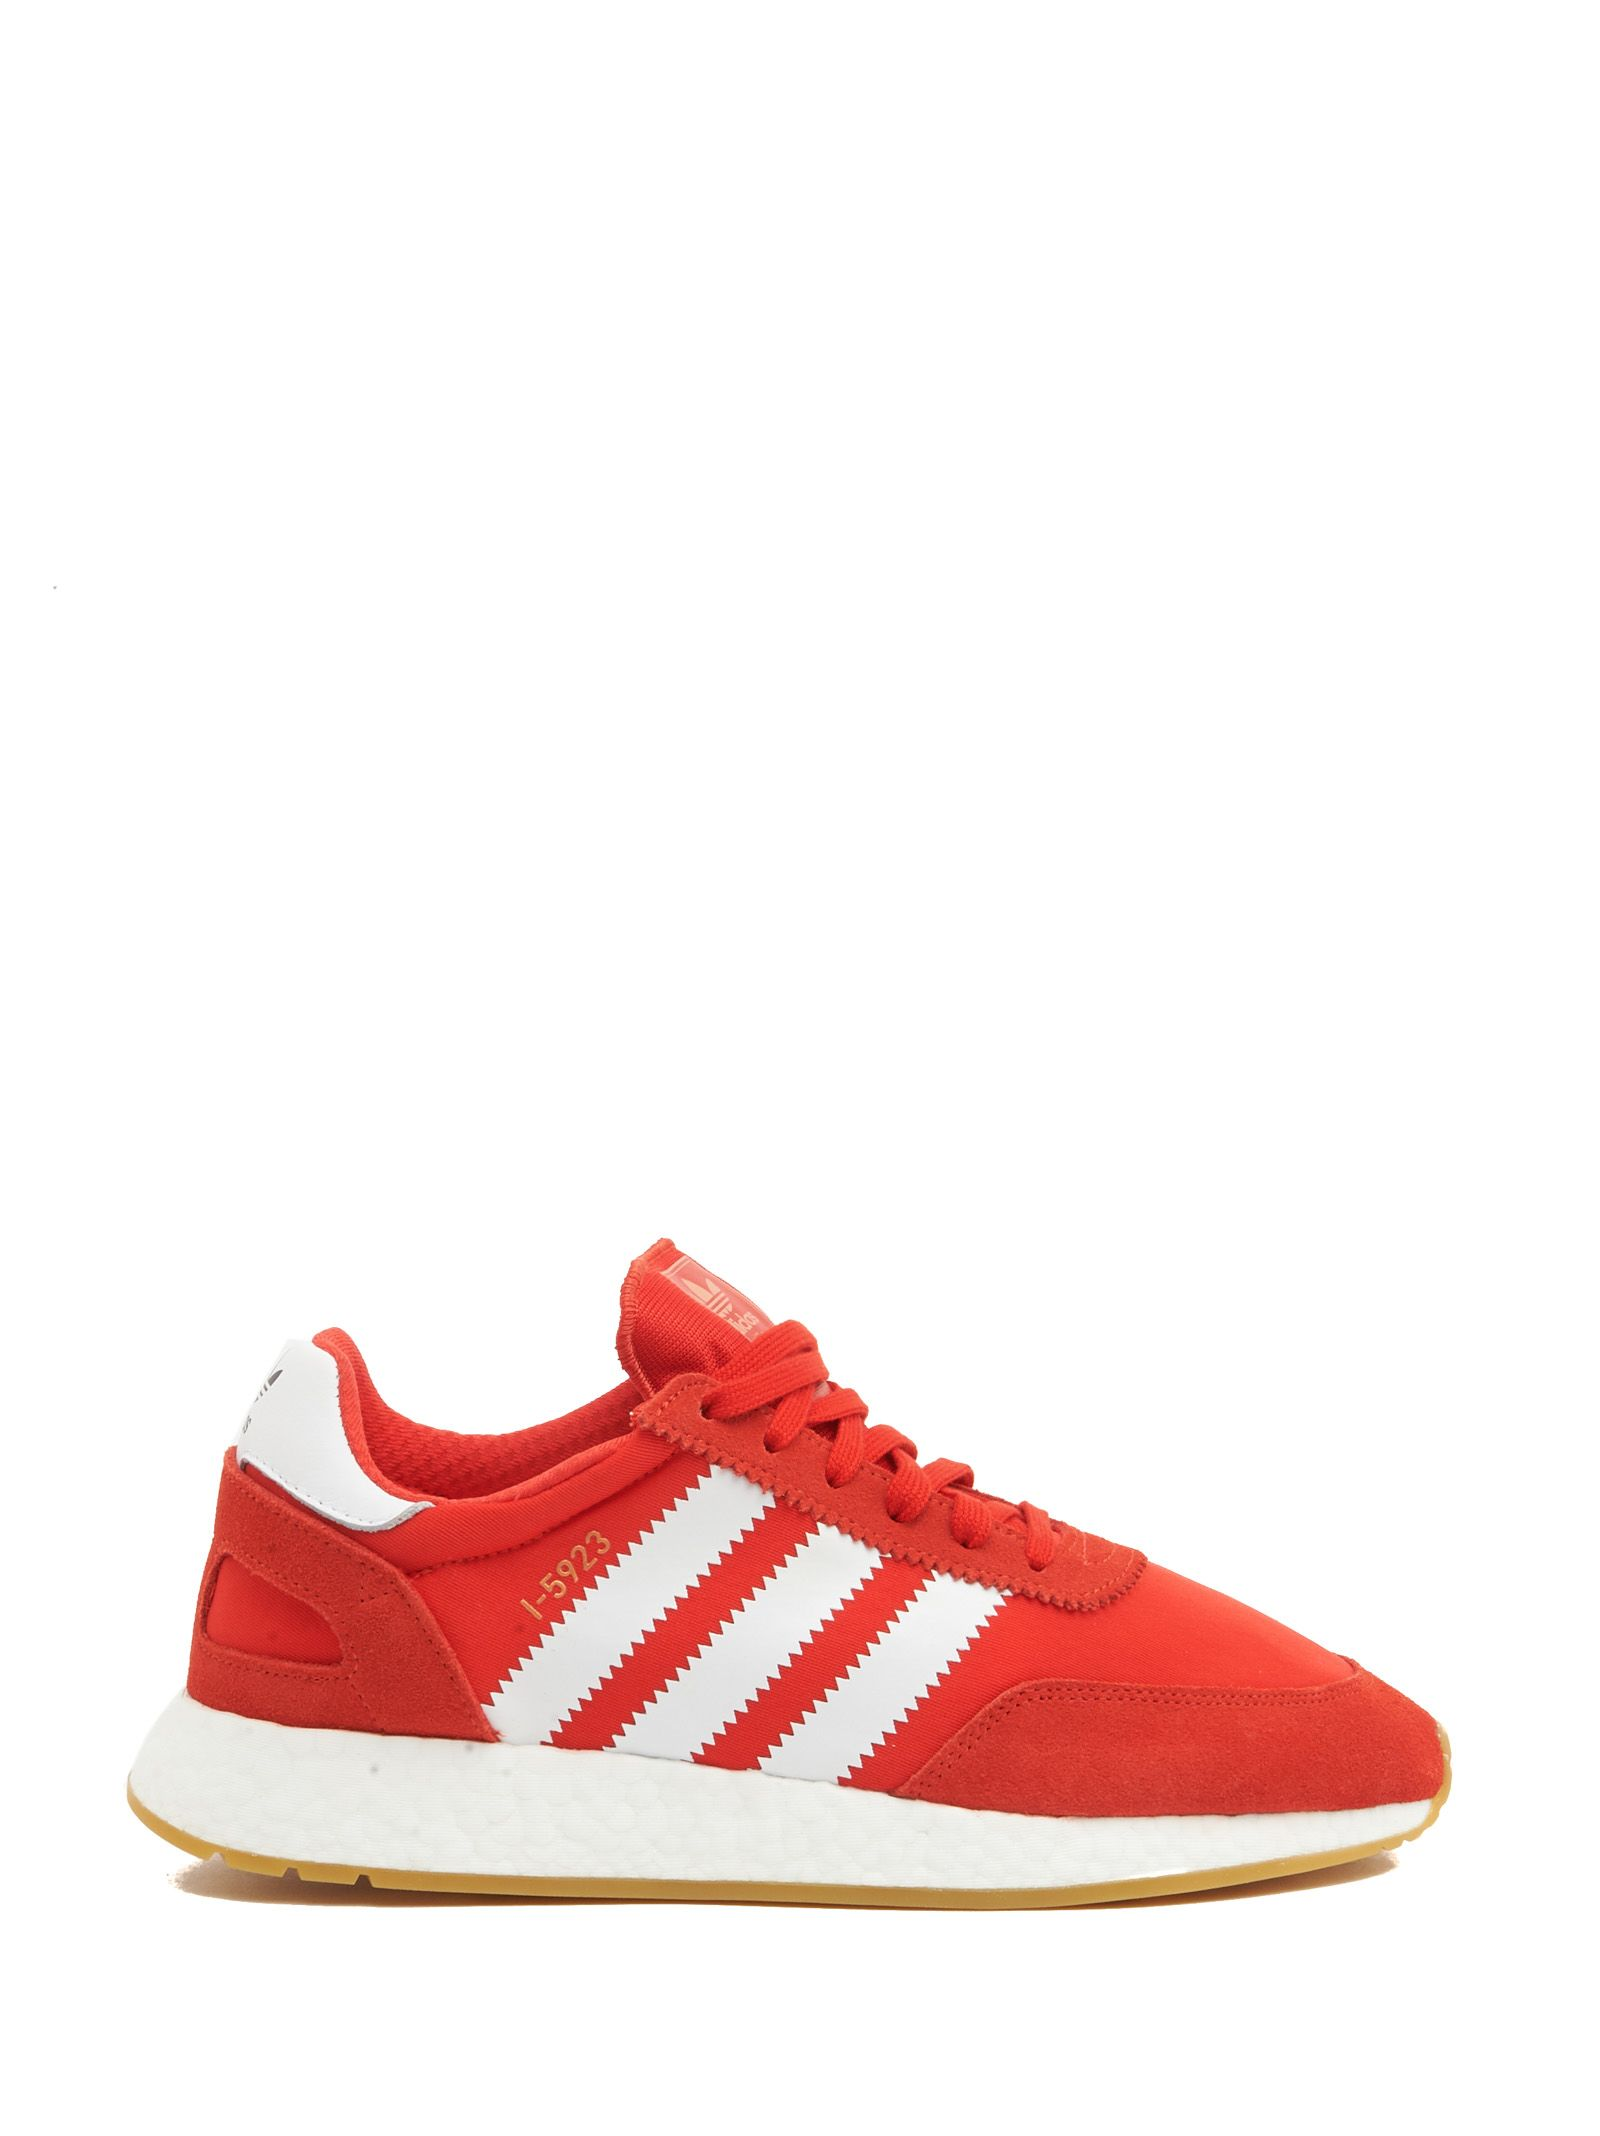 Adidas Originals Iniki Runner Shoes